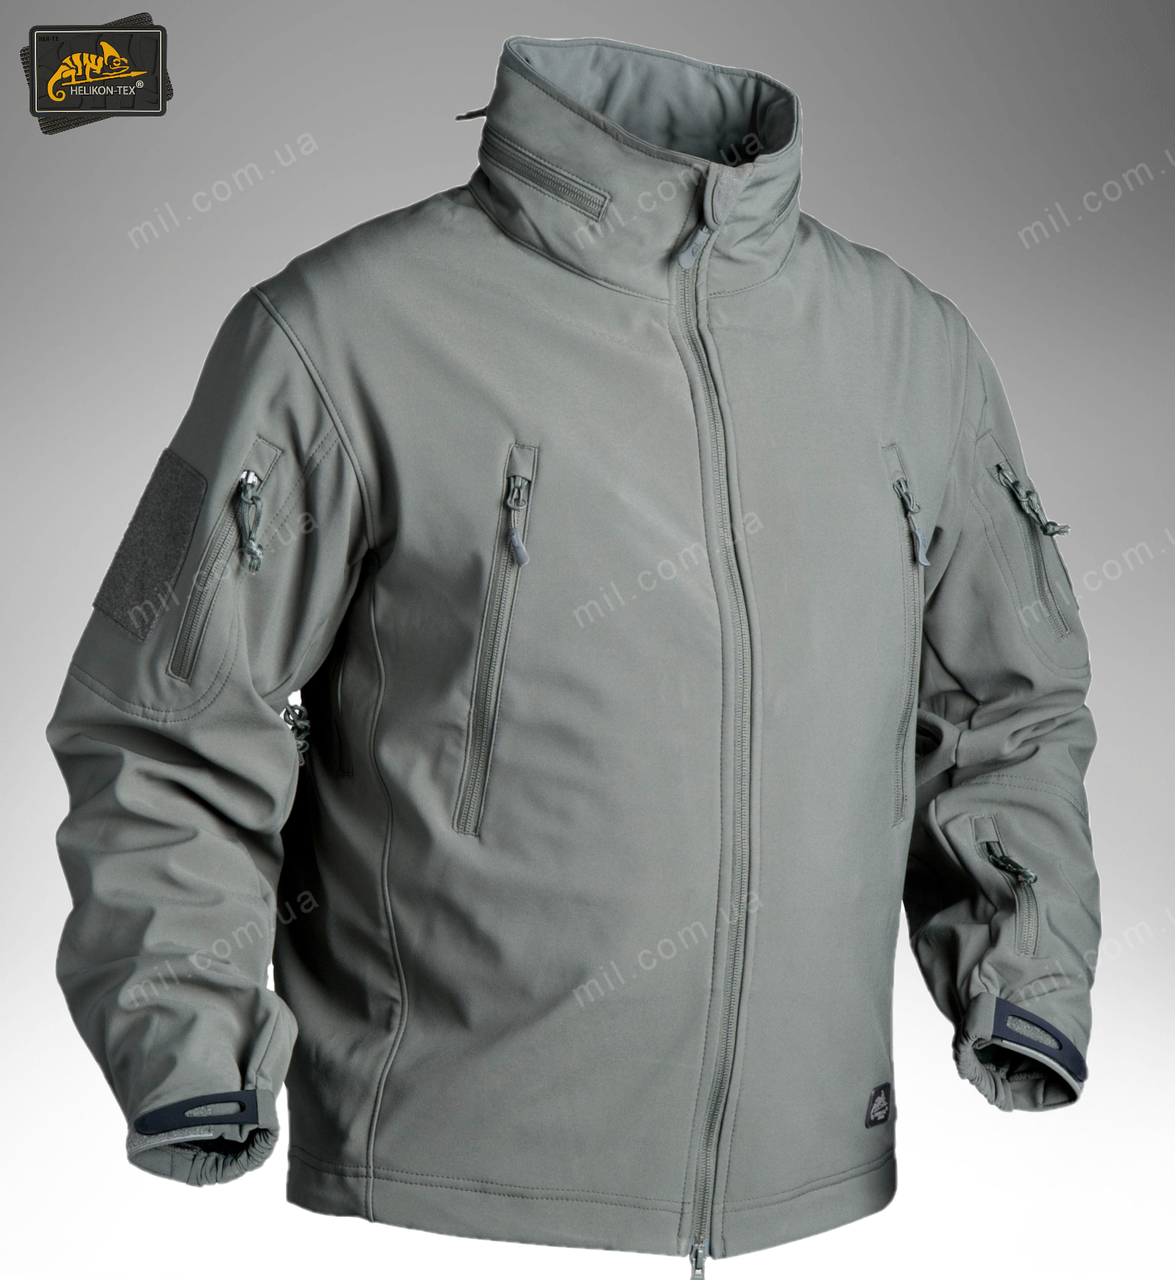 Демисезонная тактическая куртка Helikon-Tex® GUNFIGHTER Windblocker® Soft Shell (foliage green)